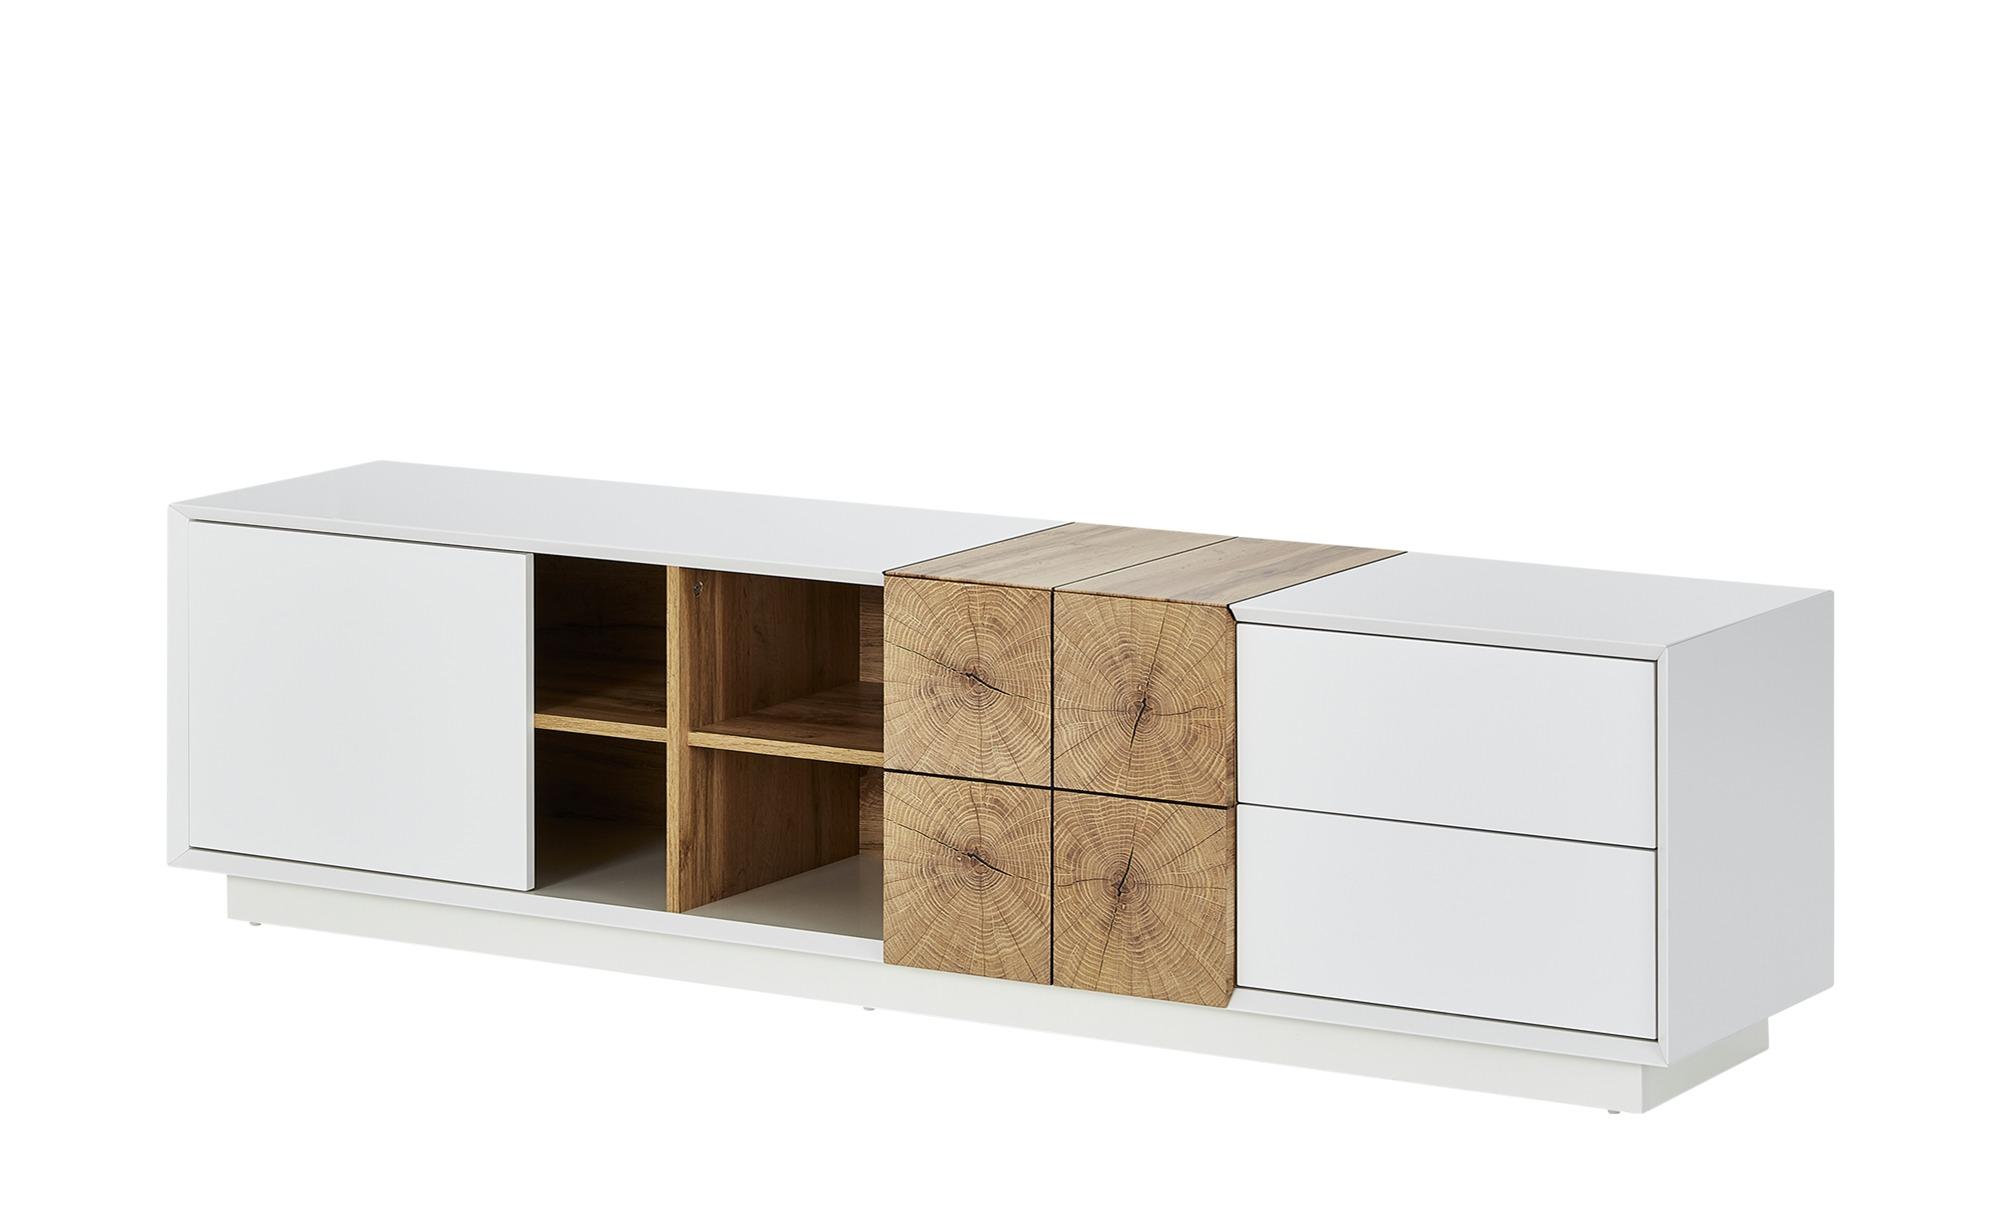 TV-Lowboard  Menaggio ¦ weiß ¦ Maße (cm): B: 180 H: 45 T: 40 TV- & Media Möbel > TV-Racks - Höffner